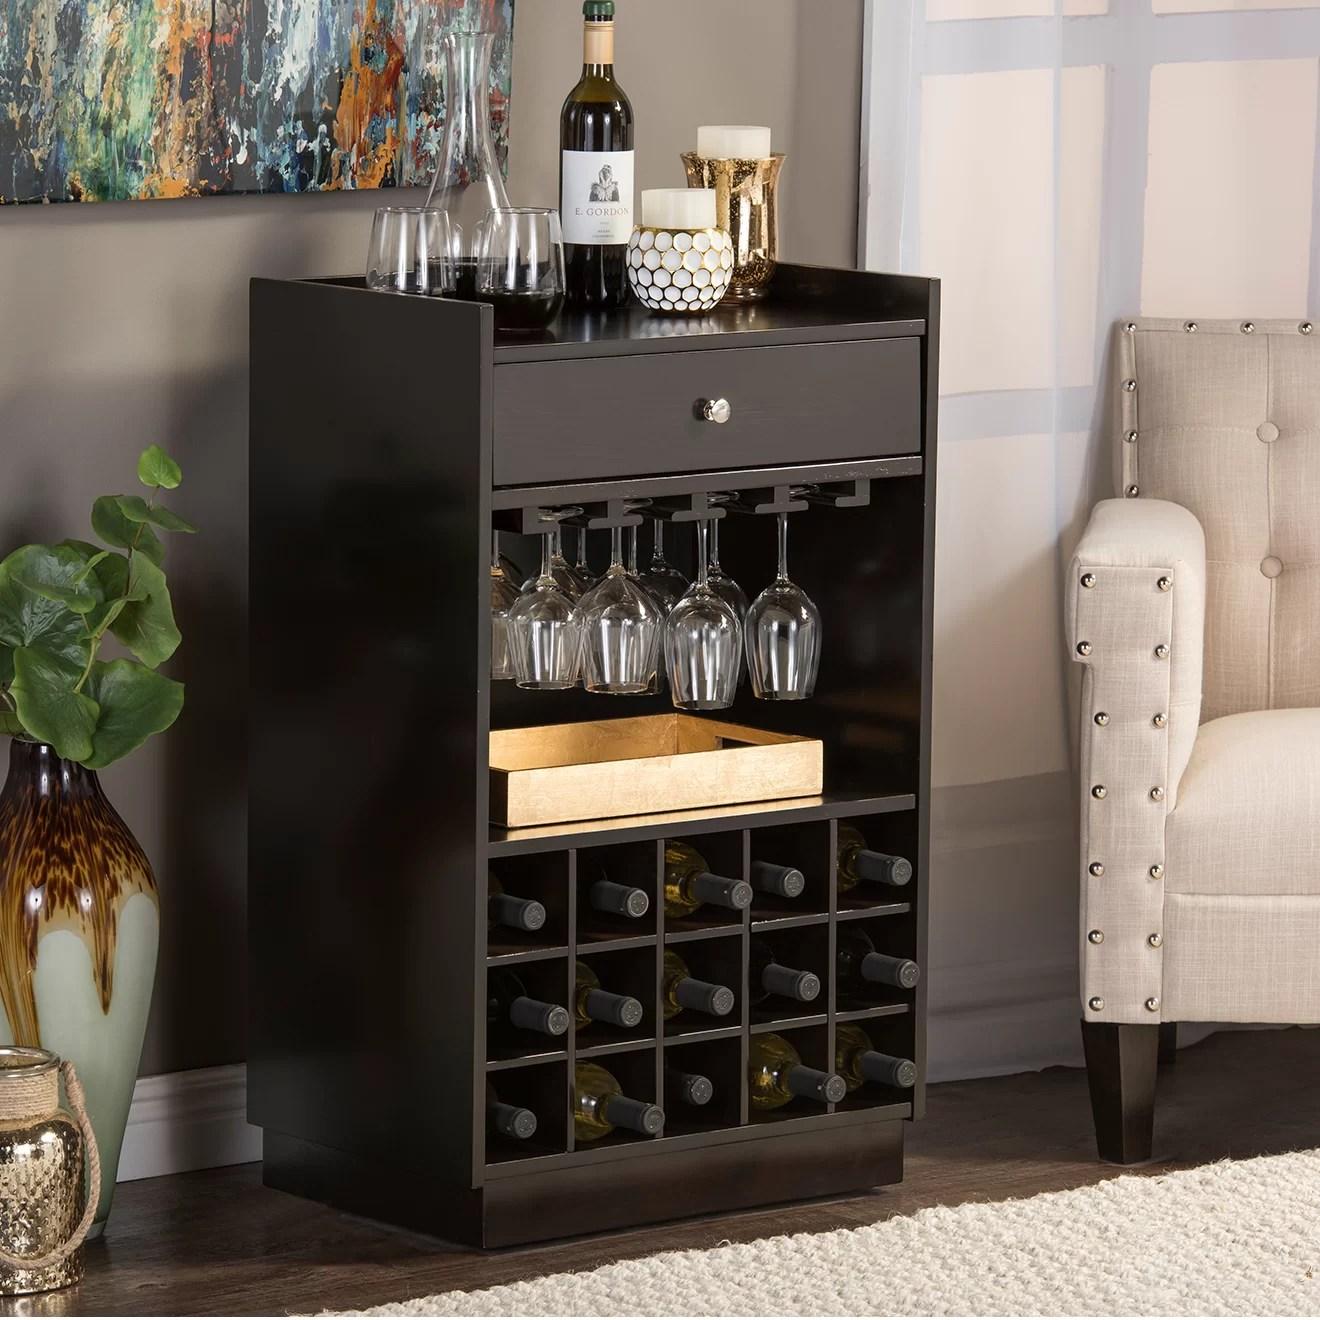 Wholesale Interiors Baxton Studio 15 Bottle Tabletop Wine